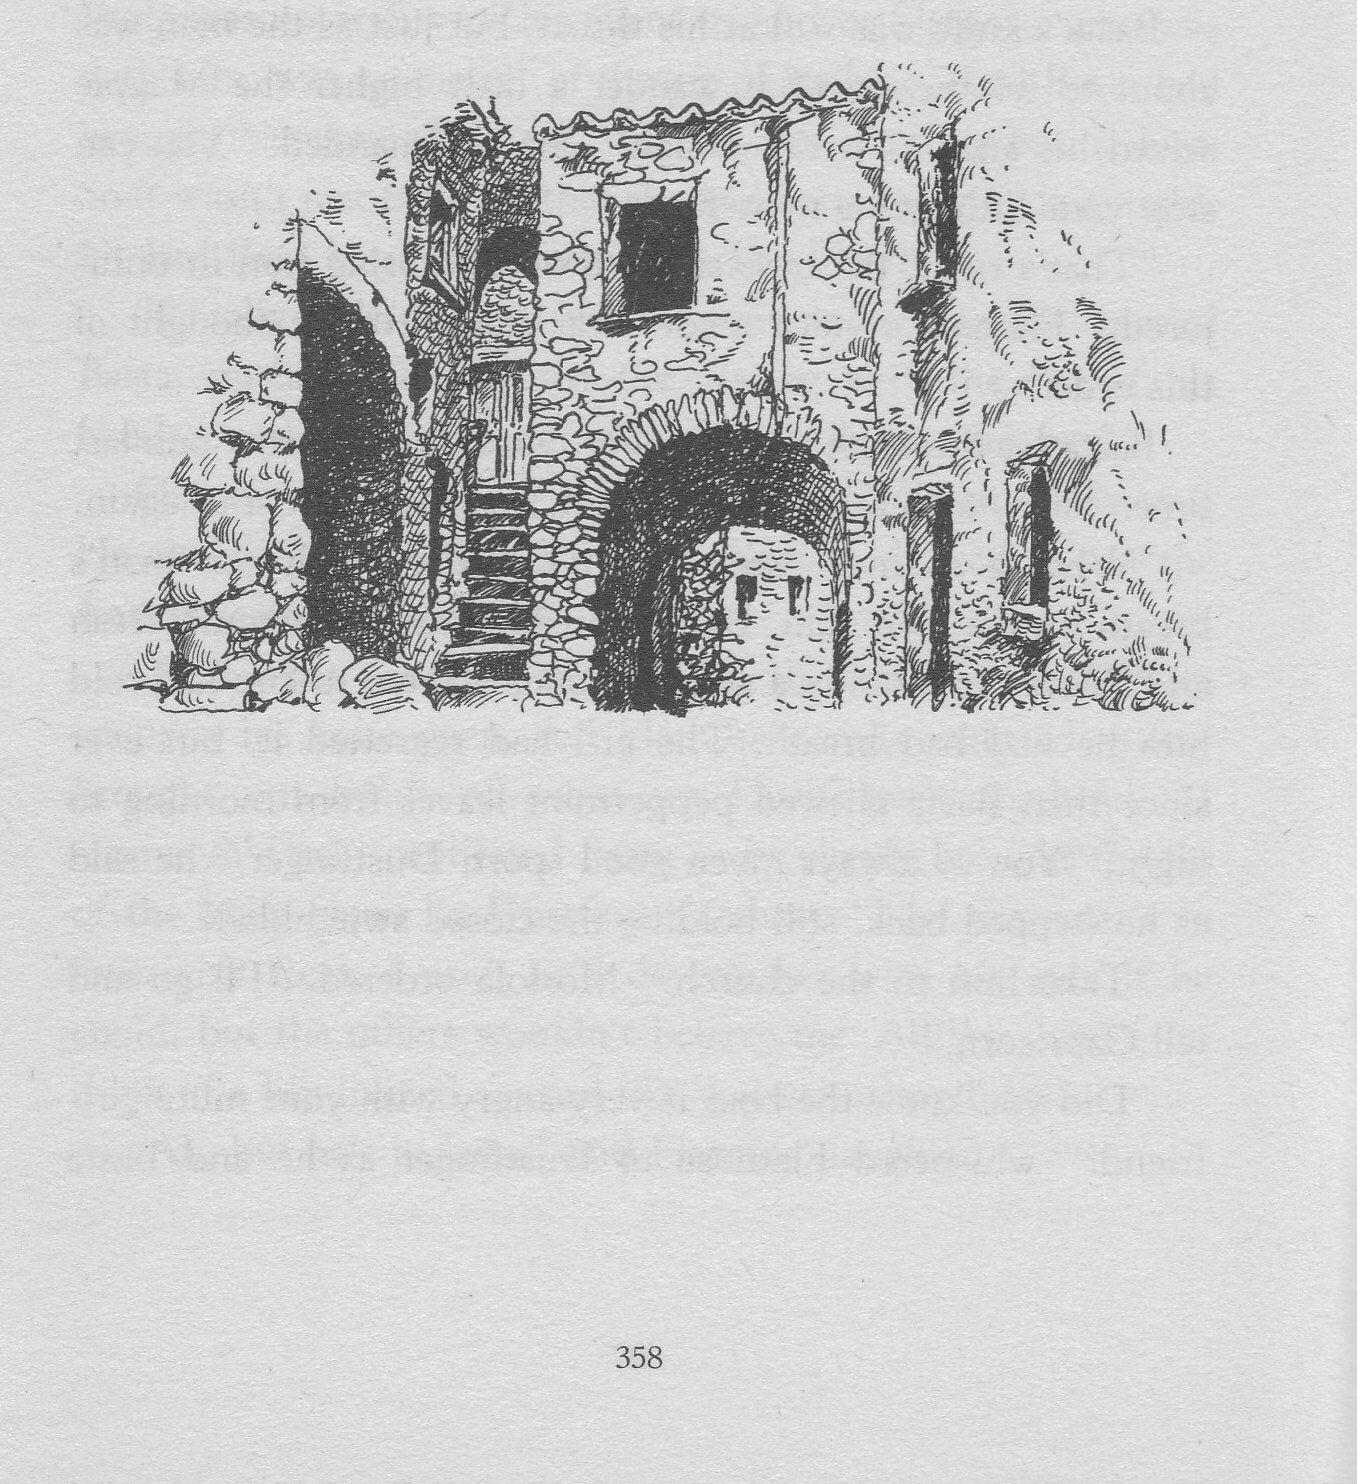 Inkheart Book Illustration By Cornelia Funke Author & Illustrator